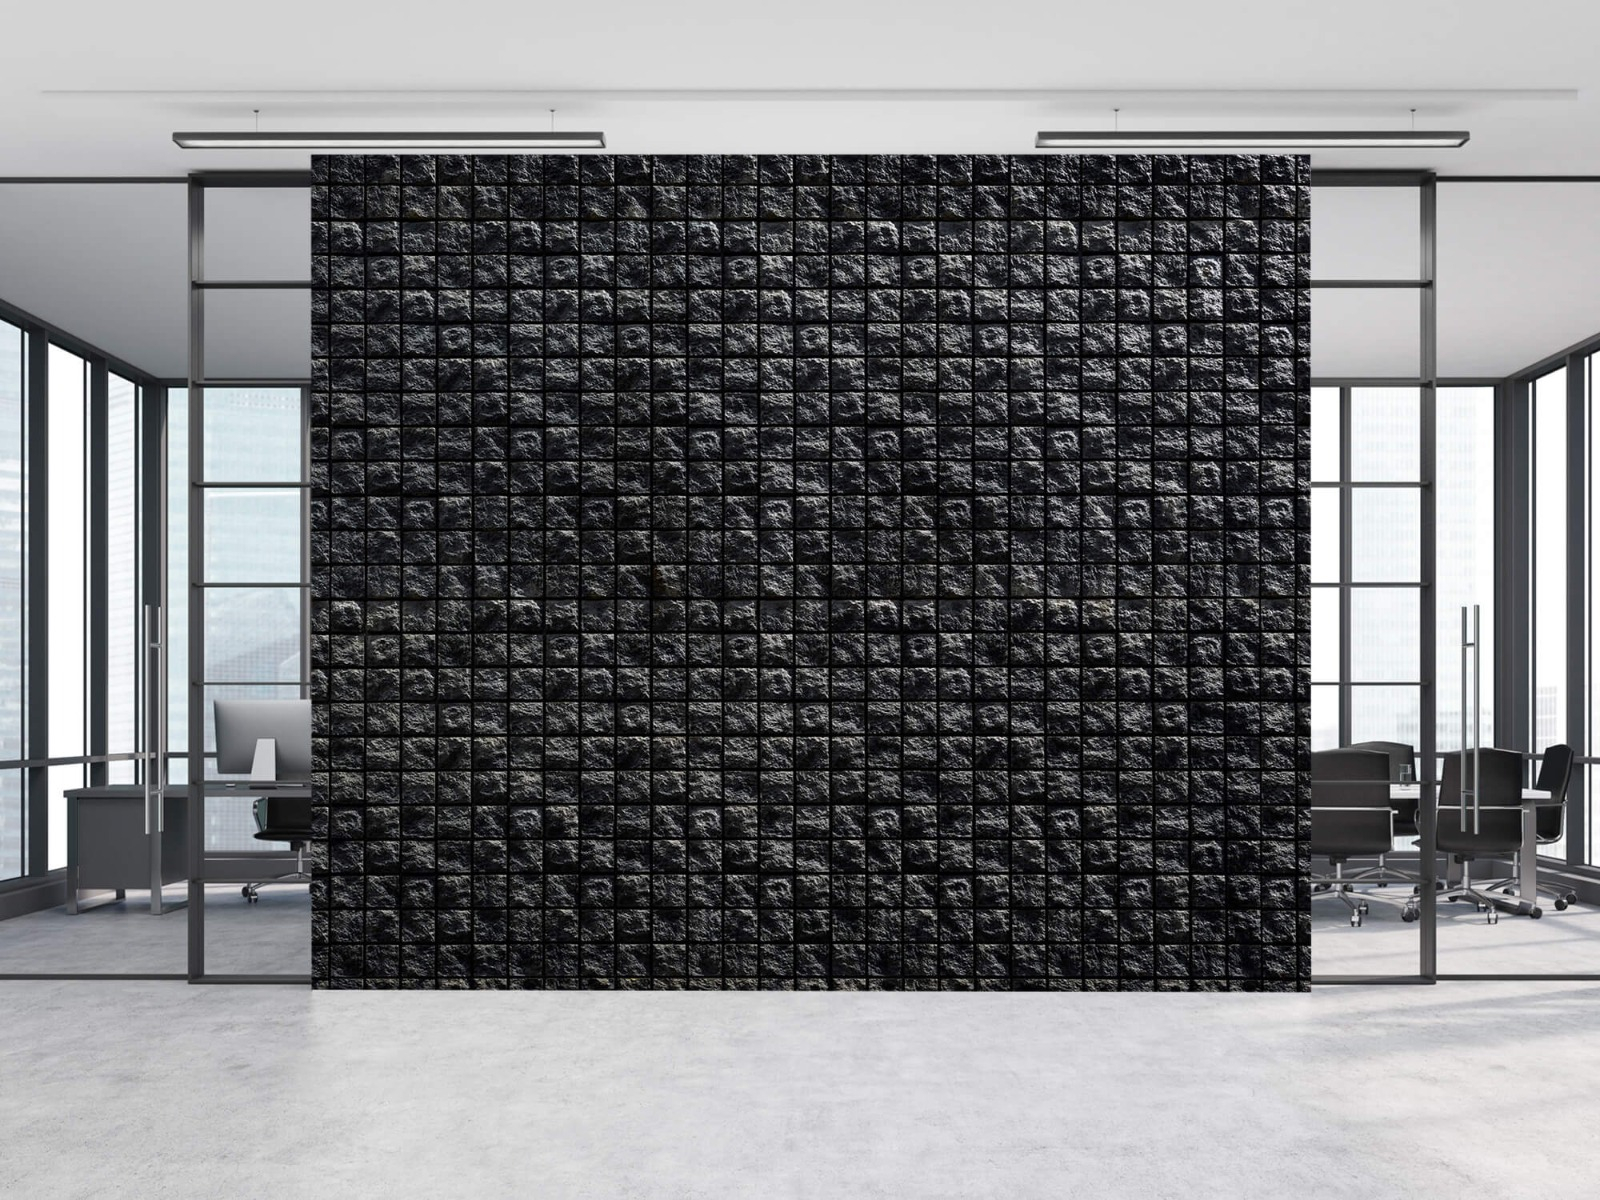 Tegel behang - Vierkante zwarte stenen - Wallexclusive - Woonkamer 8